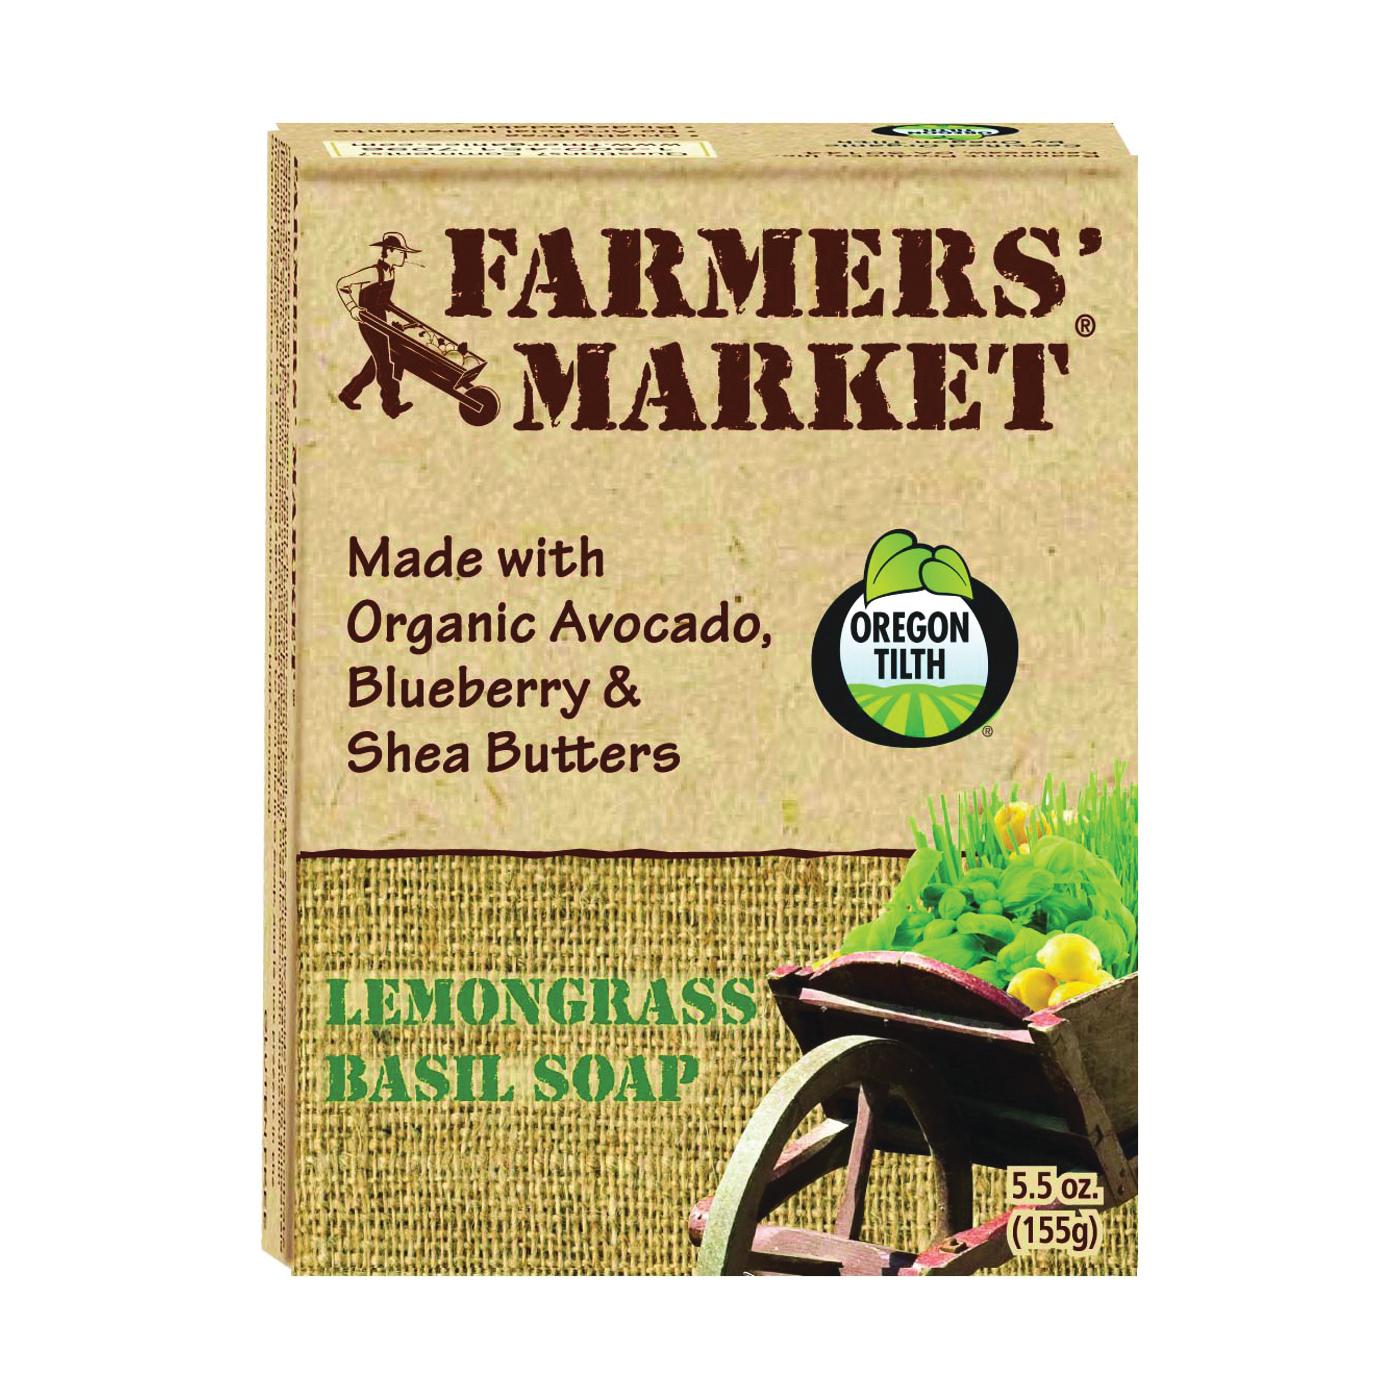 Picture of FARMERS' MARKET 946872082-12PK Bar Soap, Basil, Lemongrass, 5.5 oz Package